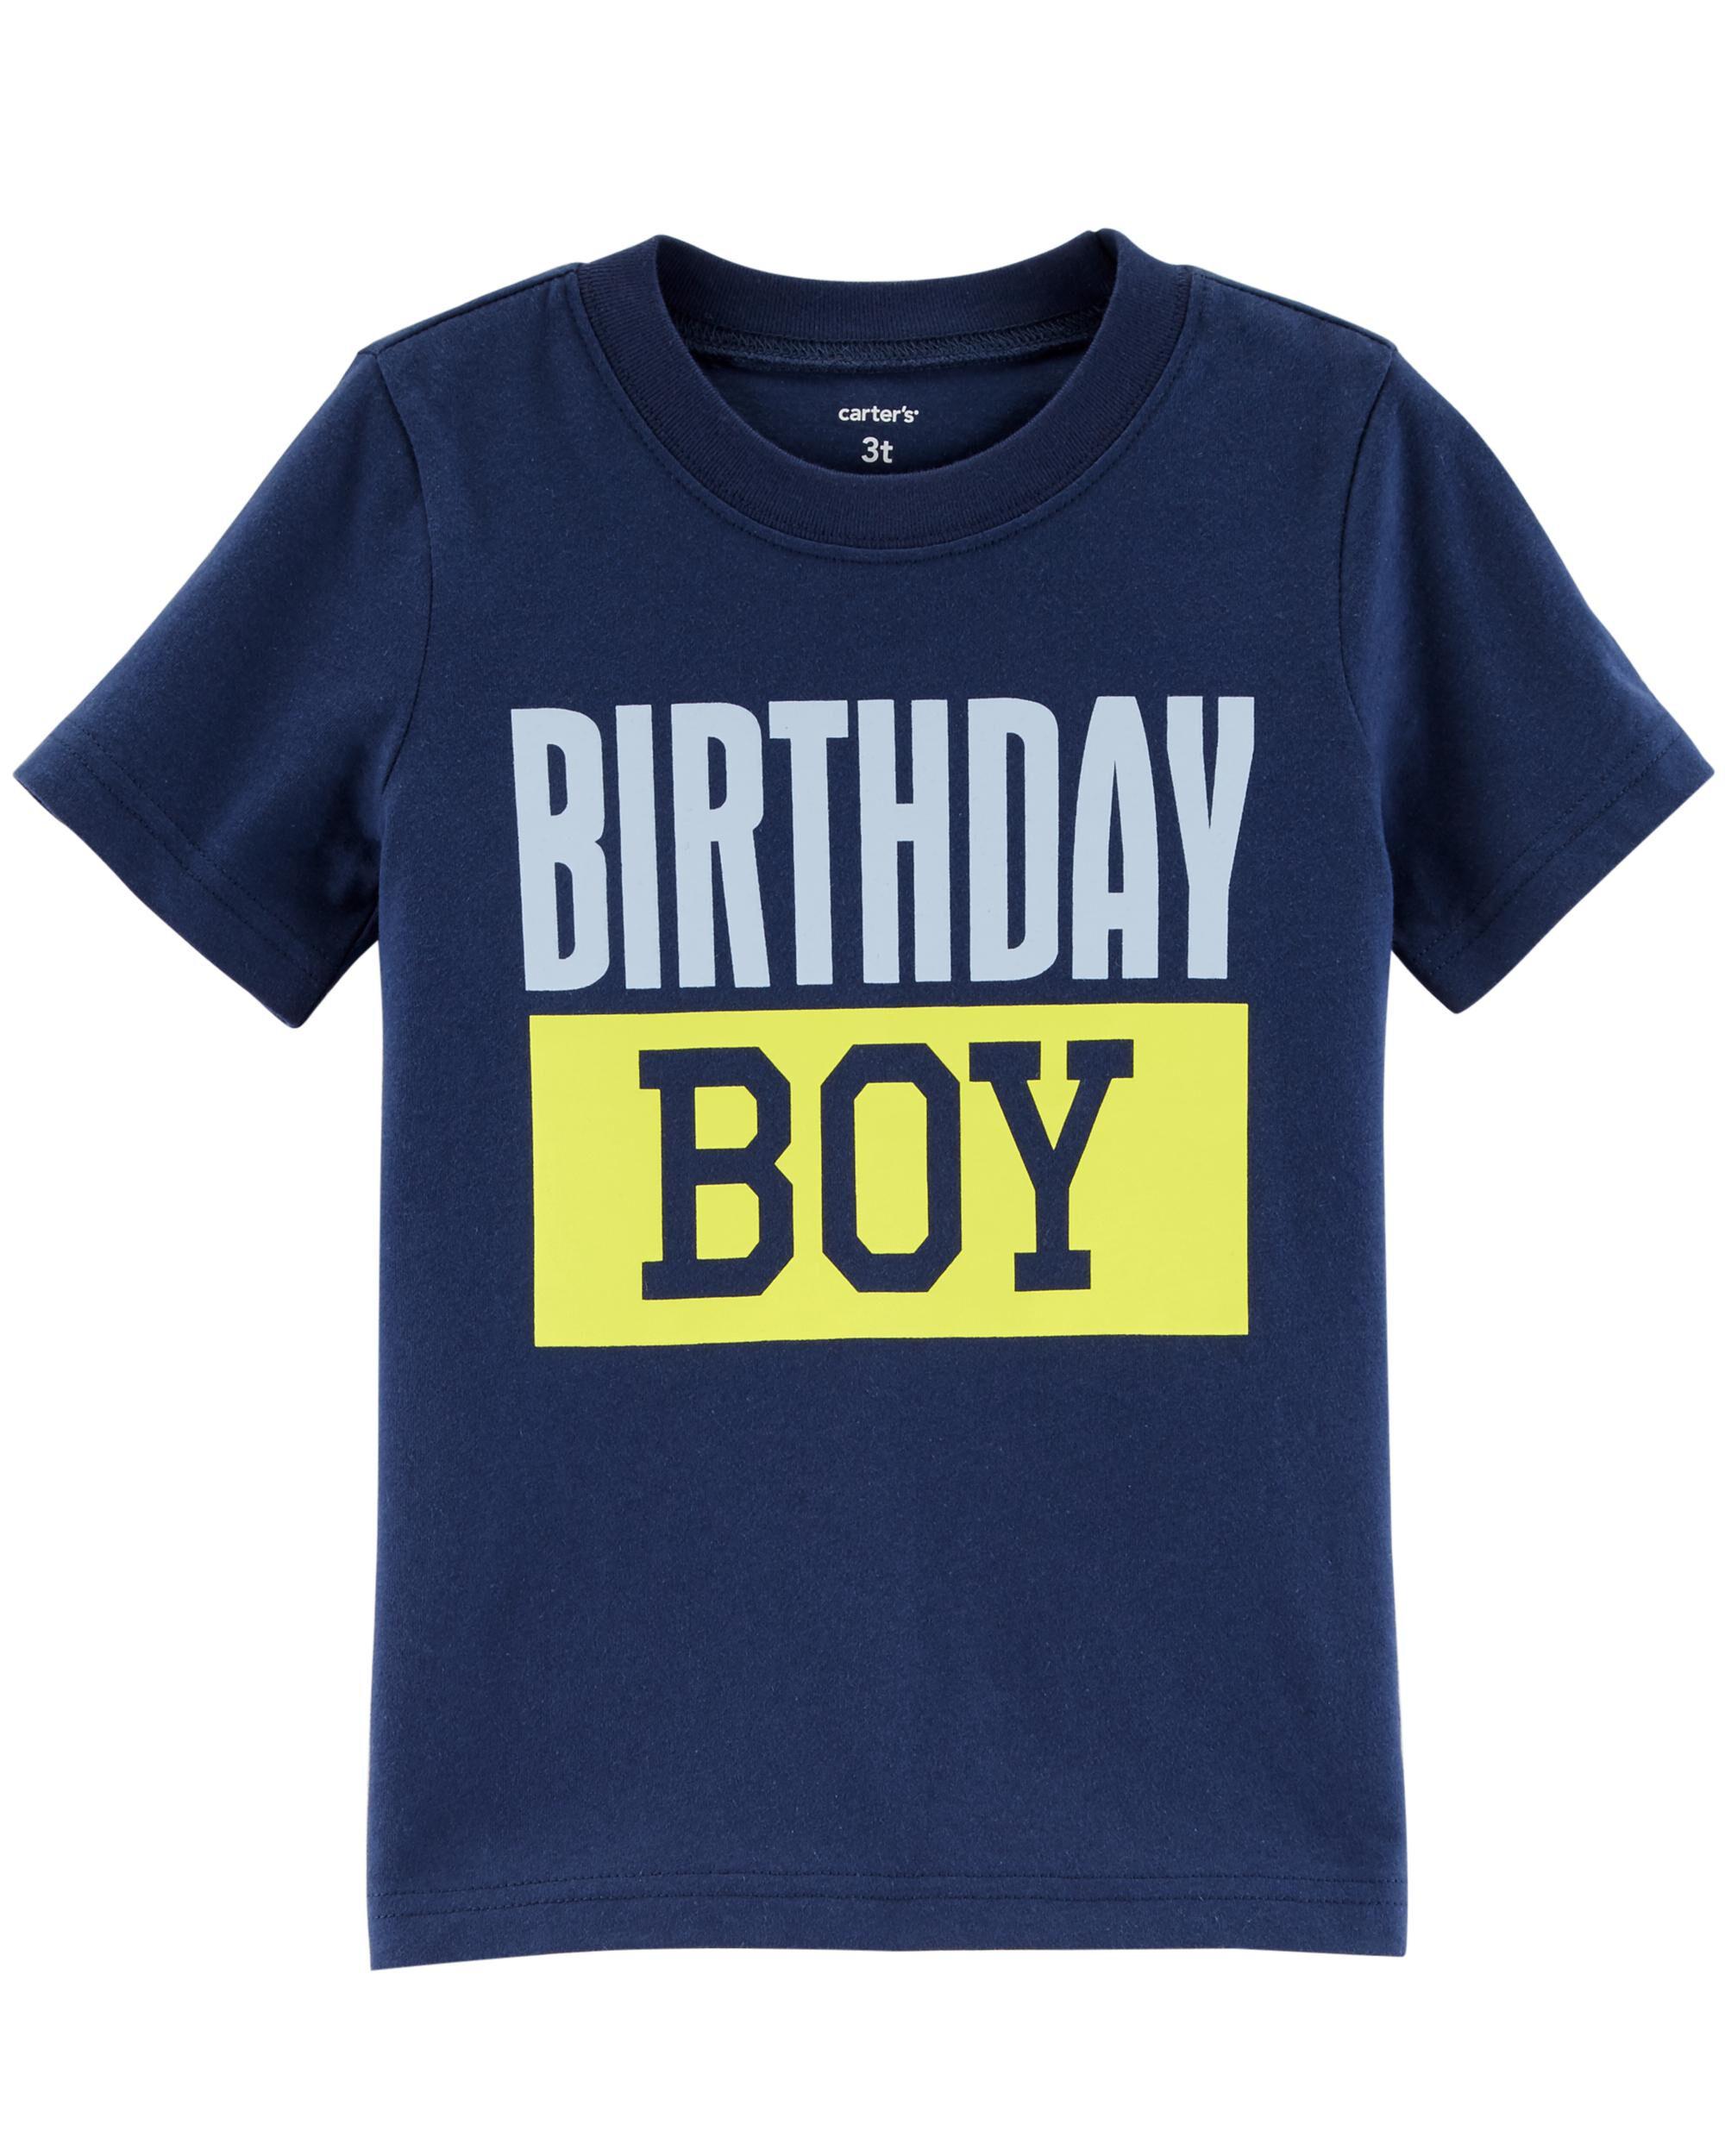 Birthday Boy Jersey Tee Loading Zoom